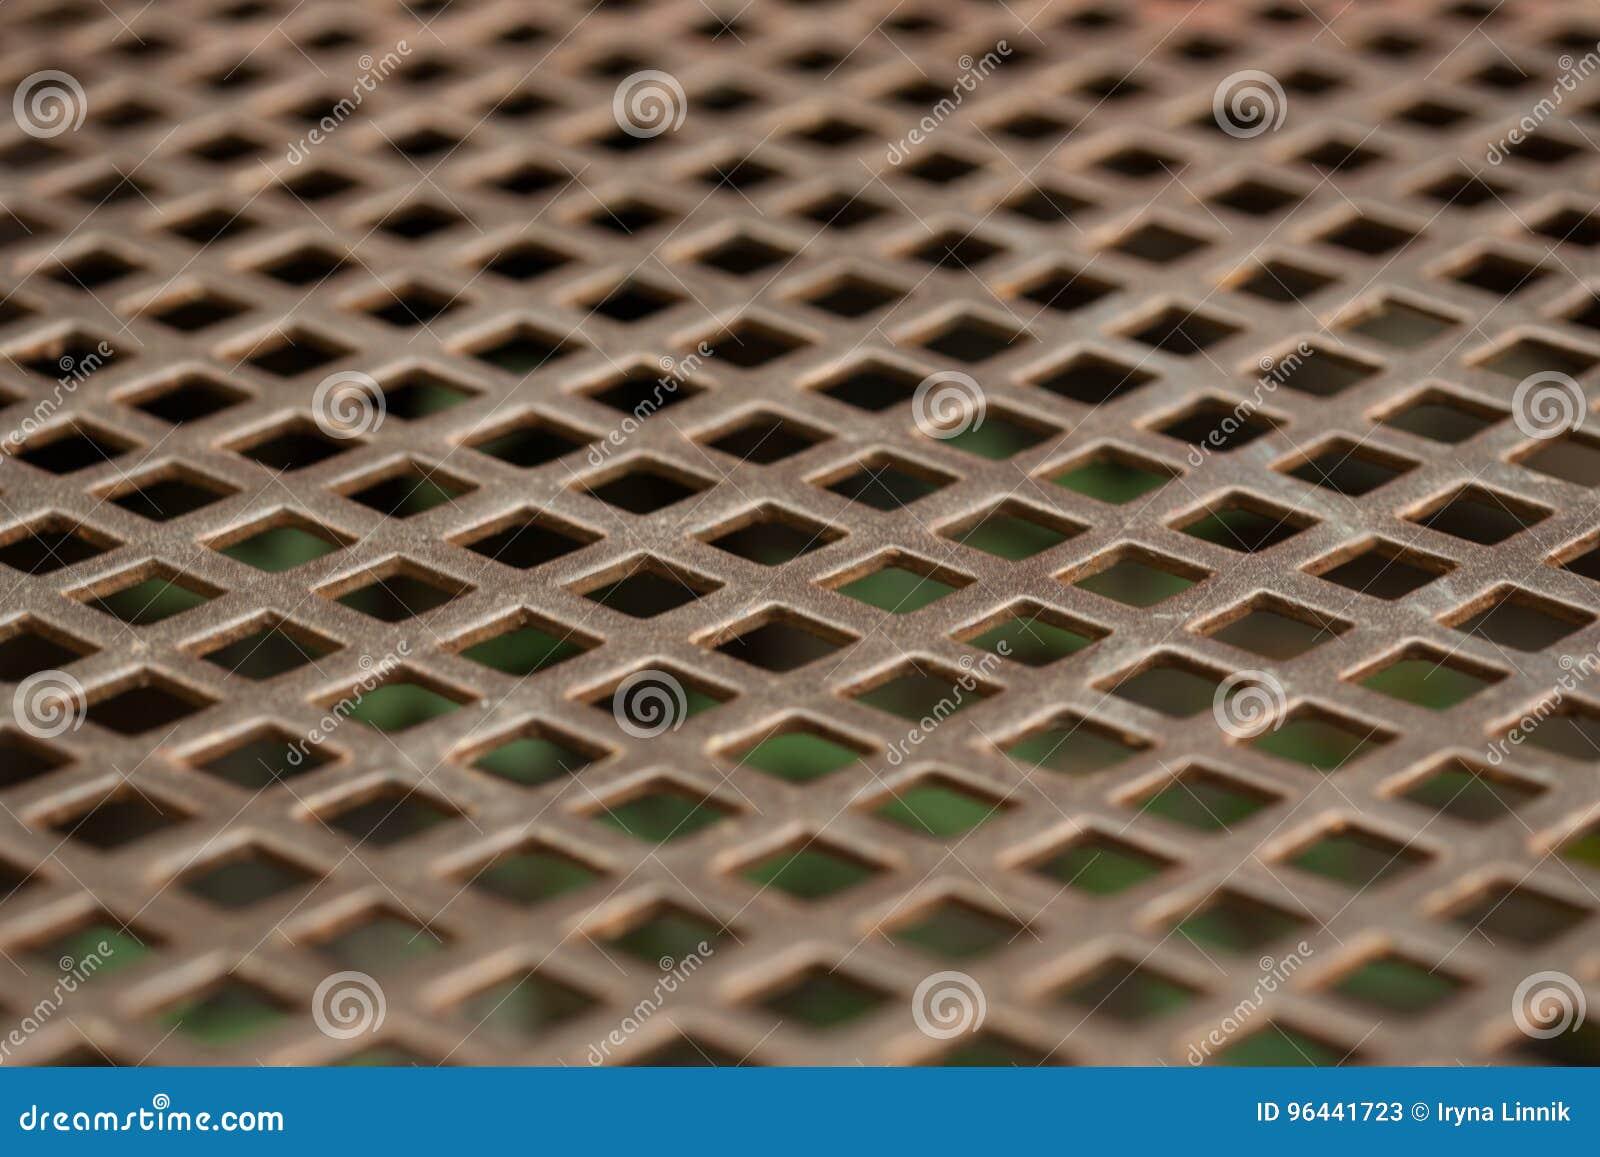 Textura del acero inoxidable chapa perforada foto de - Chapas de acero inoxidable ...